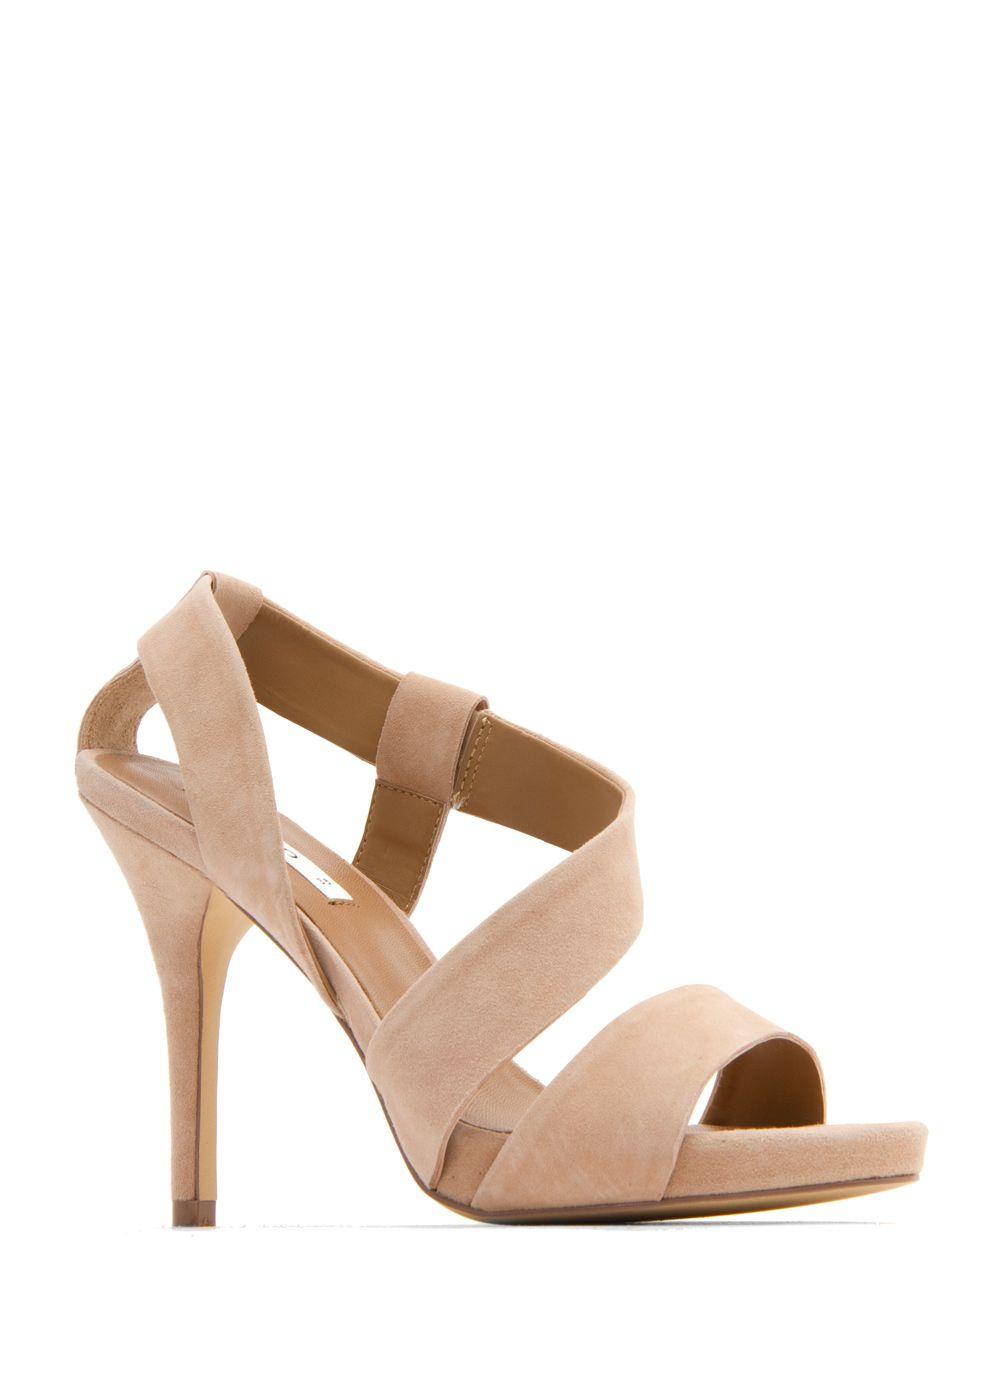 Asymmetrische sandalen €22,95